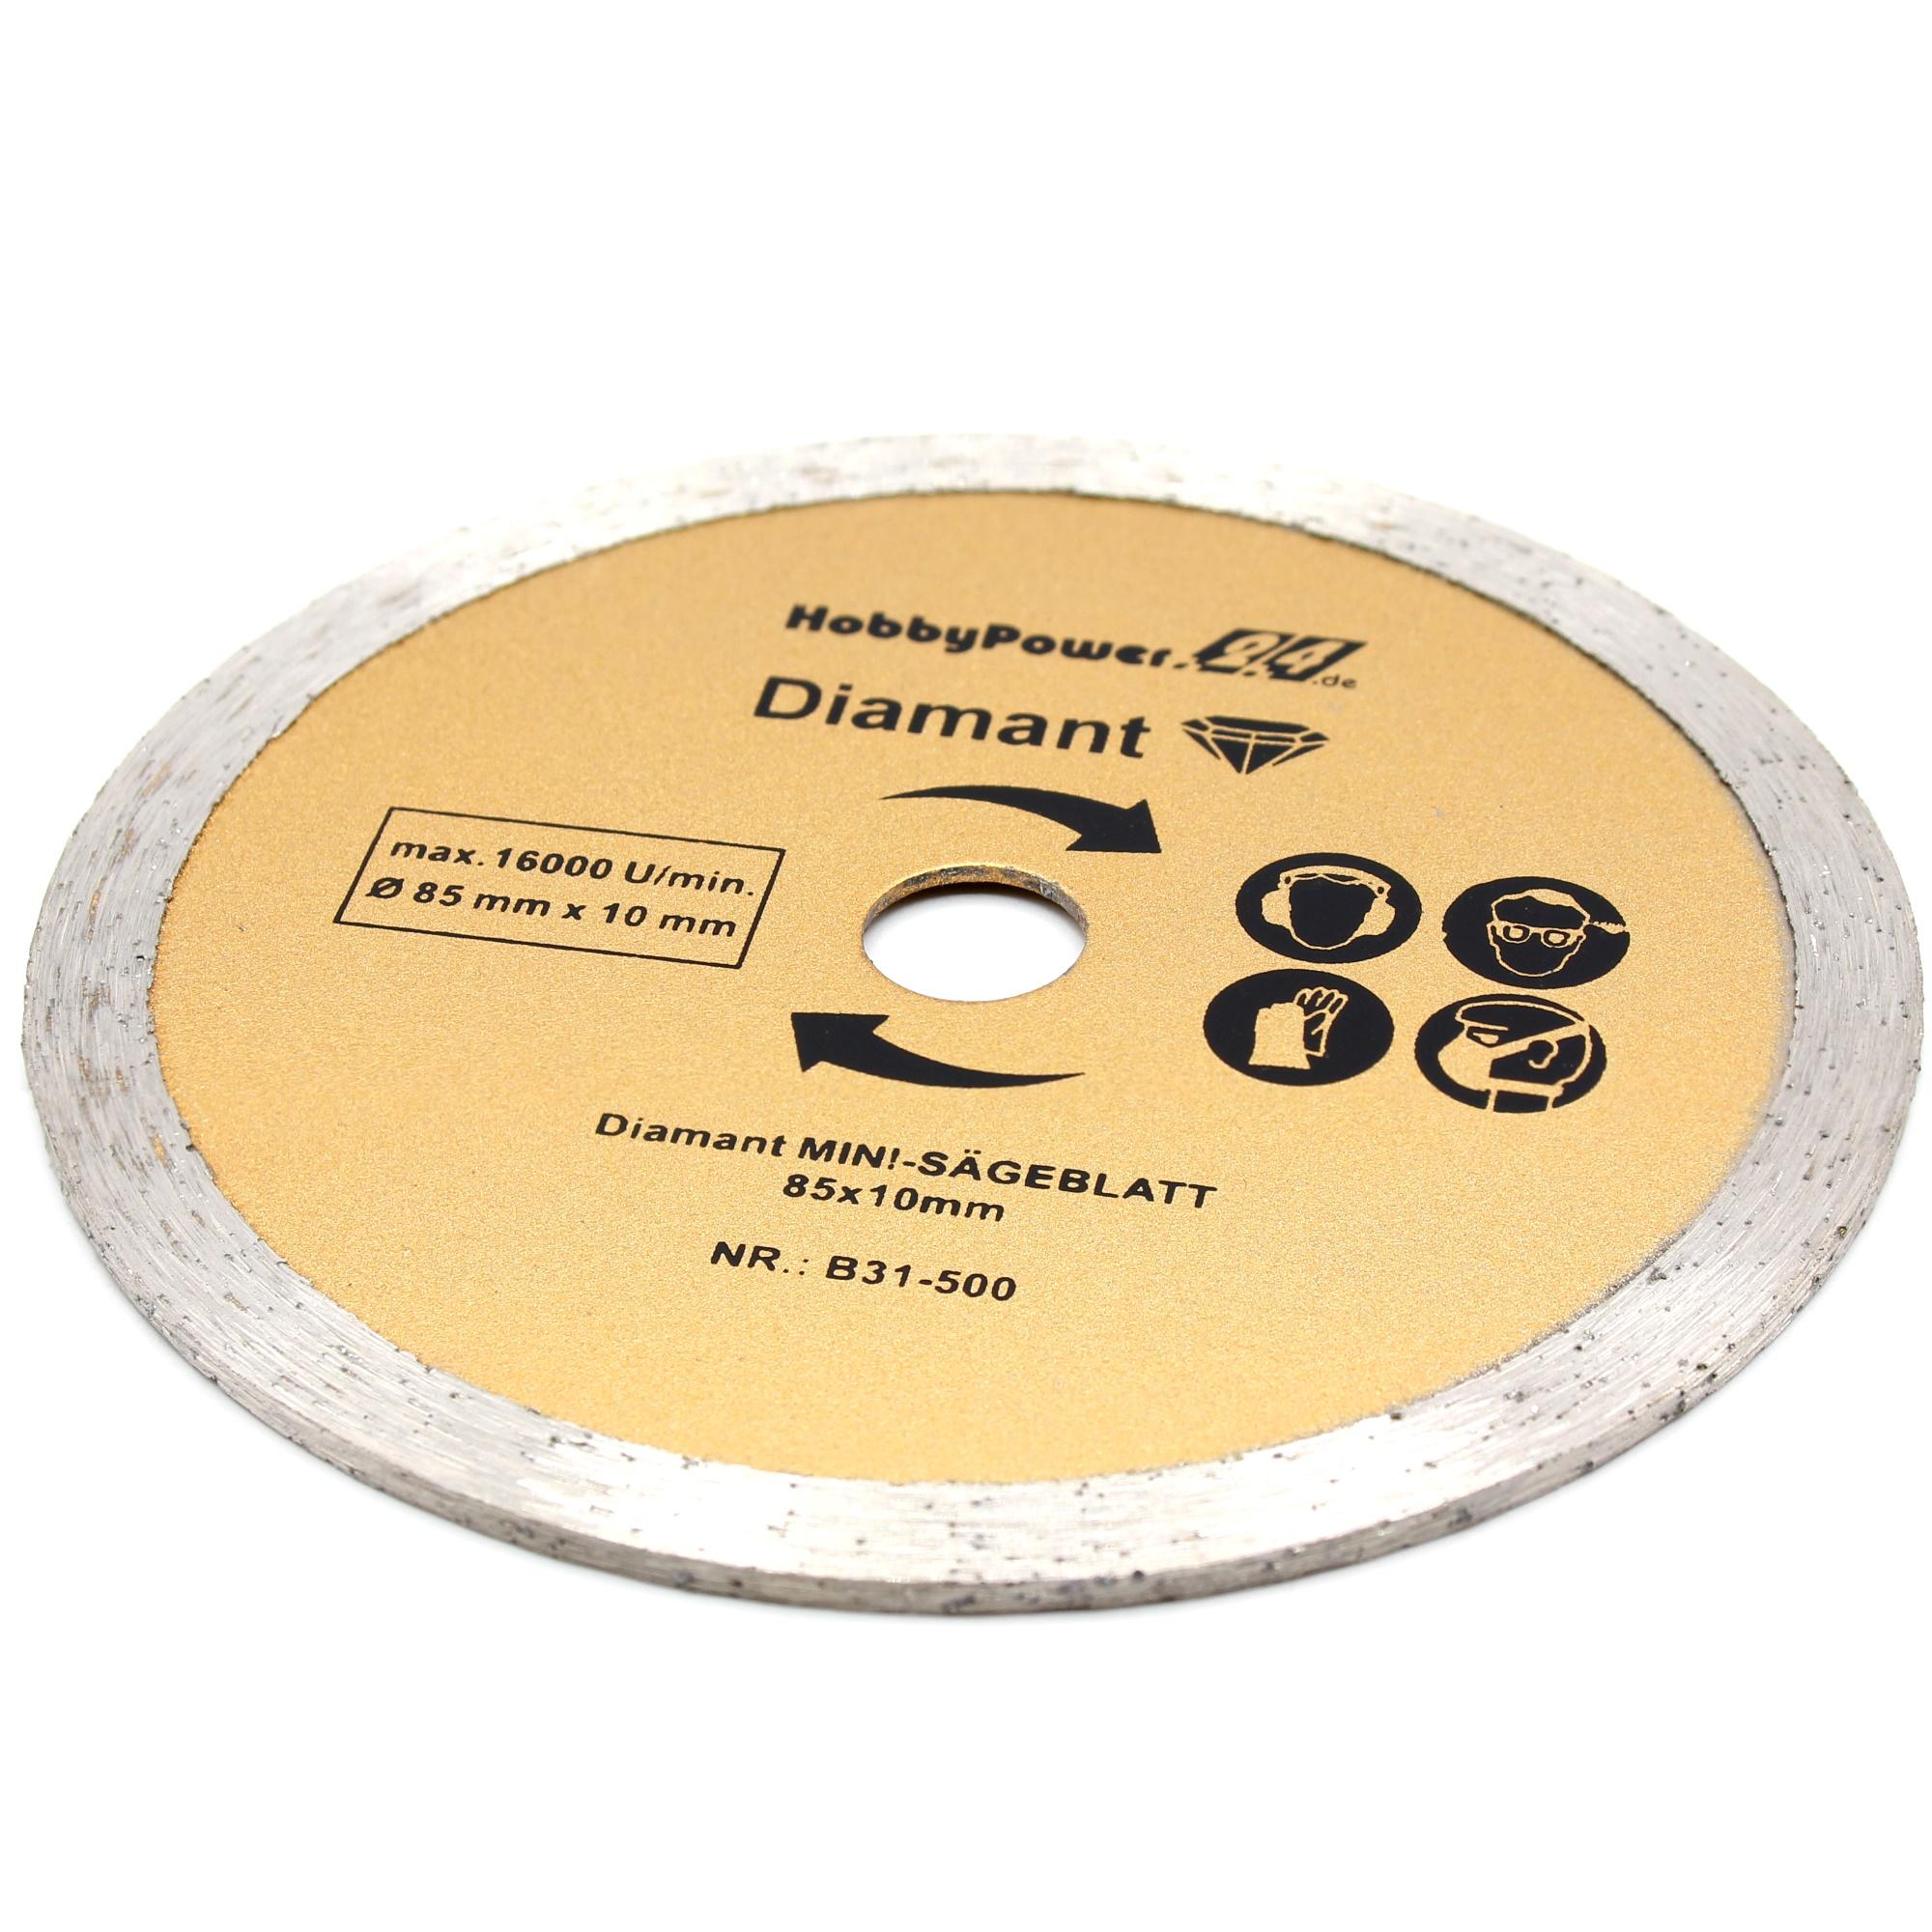 3 Mini Kreissägeblatt Trennscheibe Ø 85mm 10mm für Handkreissäge Tauchkreissäge